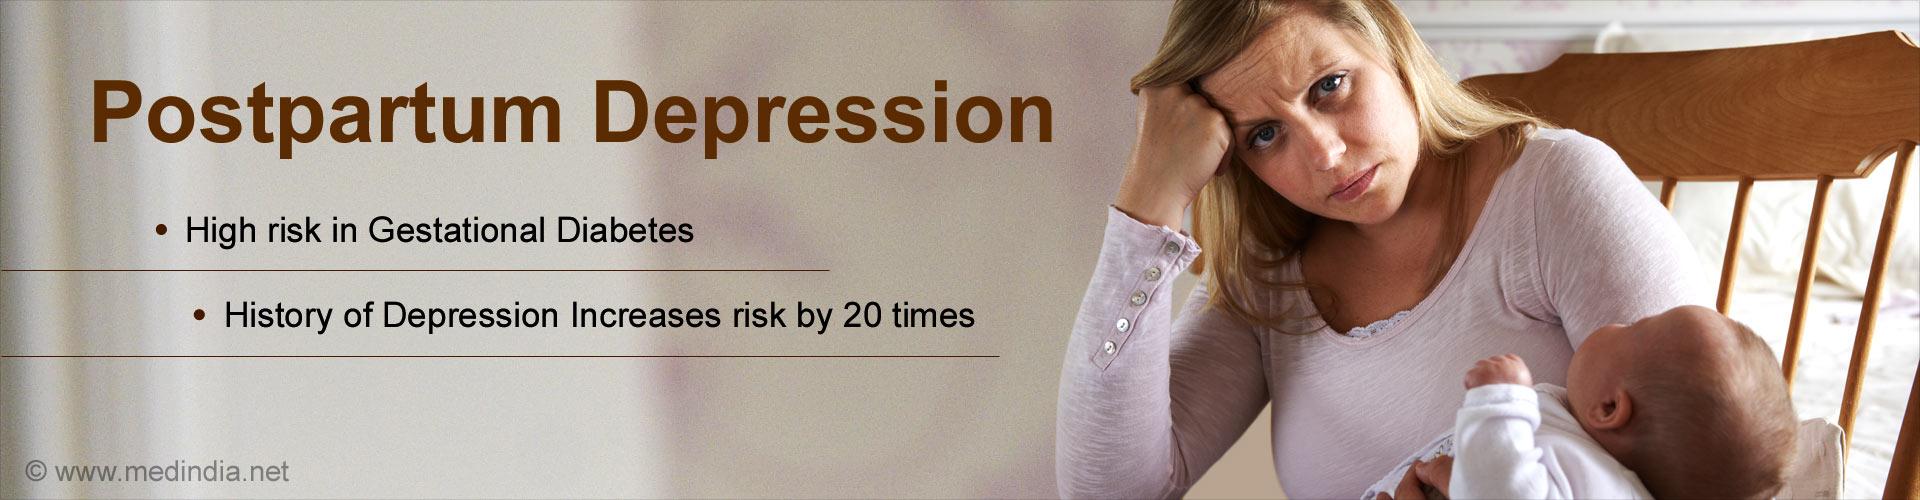 Gestational Diabetes Increases Postpartum Depression Risk